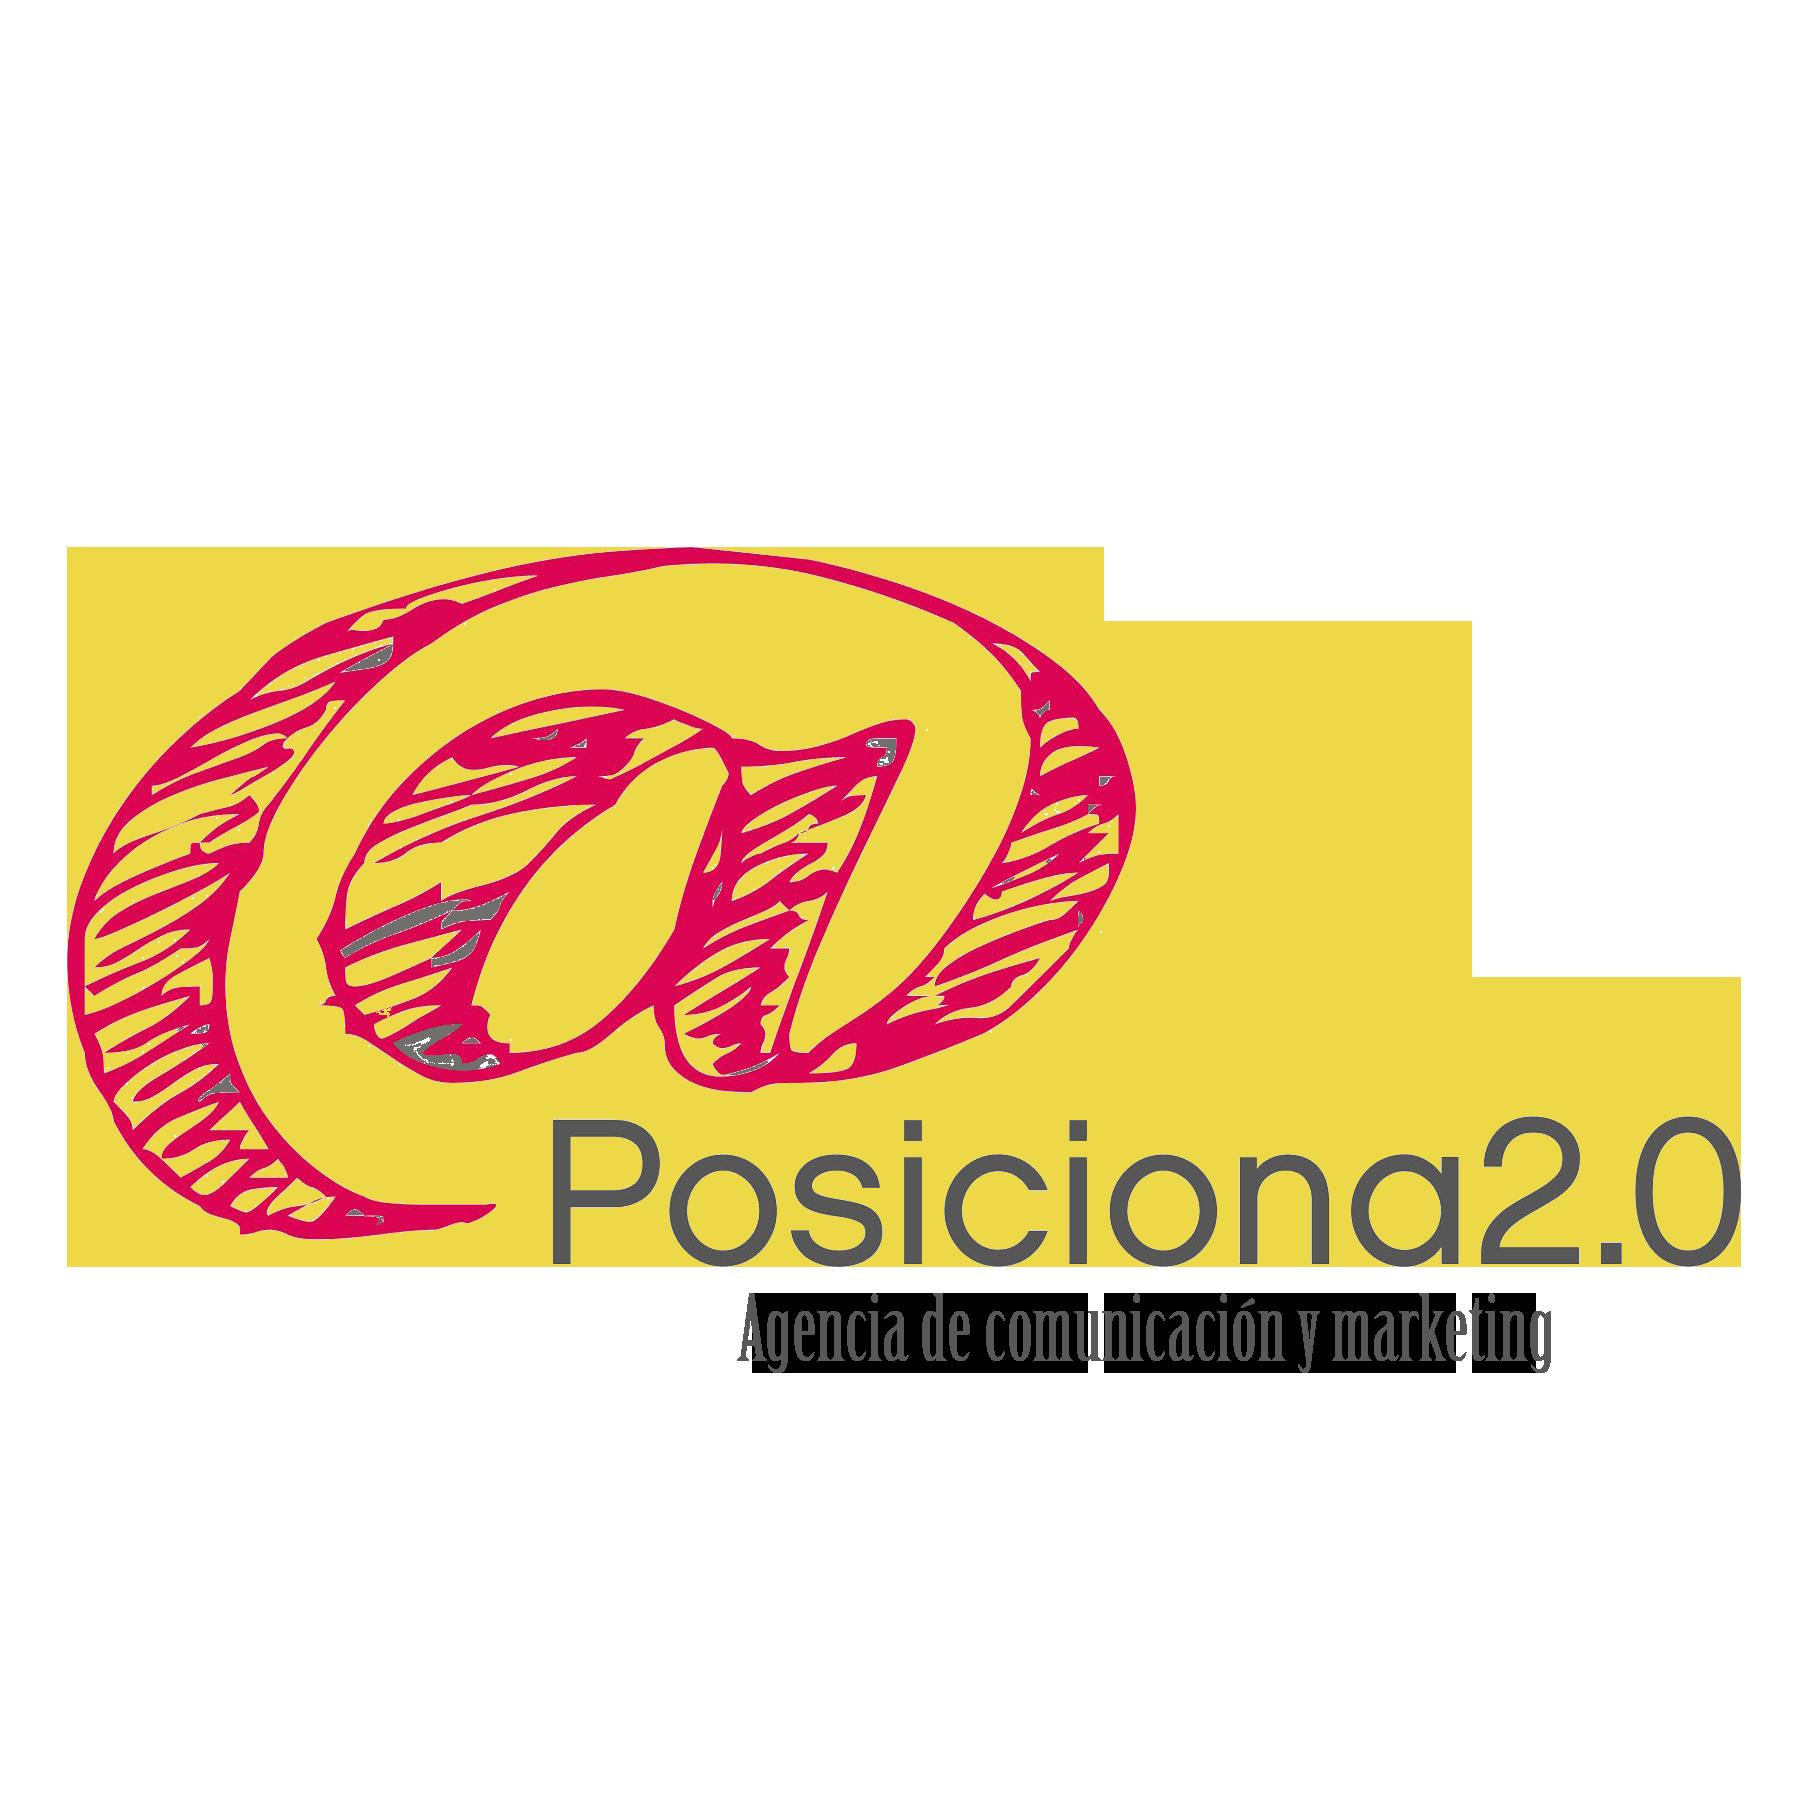 Posiciona2.0 Gandia